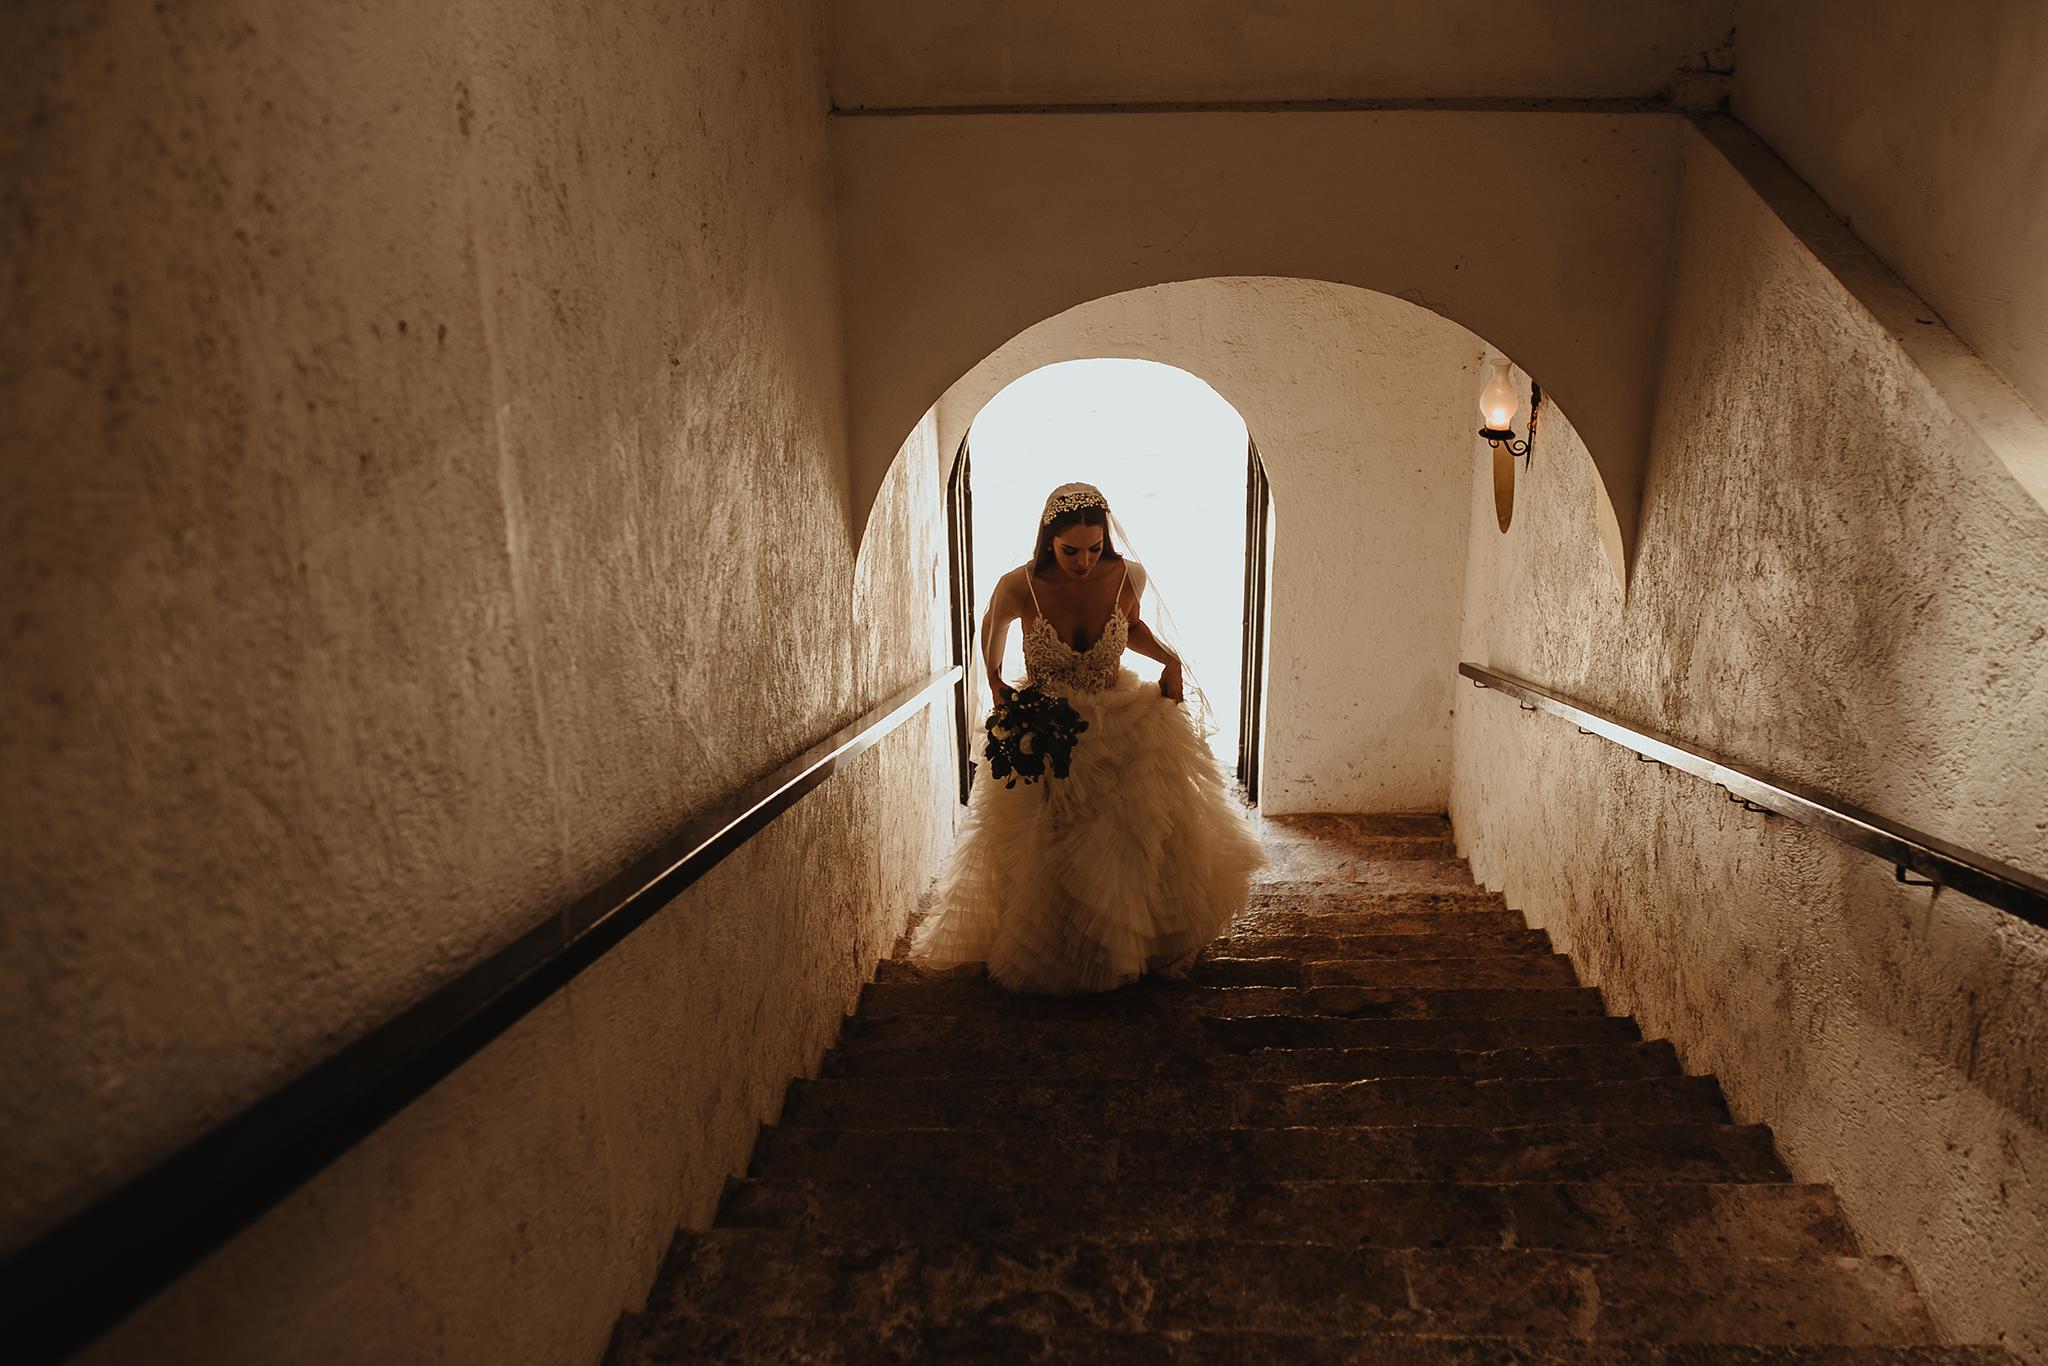 0176R&F__WeddingDestination_Weddingmerida_BodaMexico_FotografoDeBodas_FabrizioSimoneenFotografo.jpg